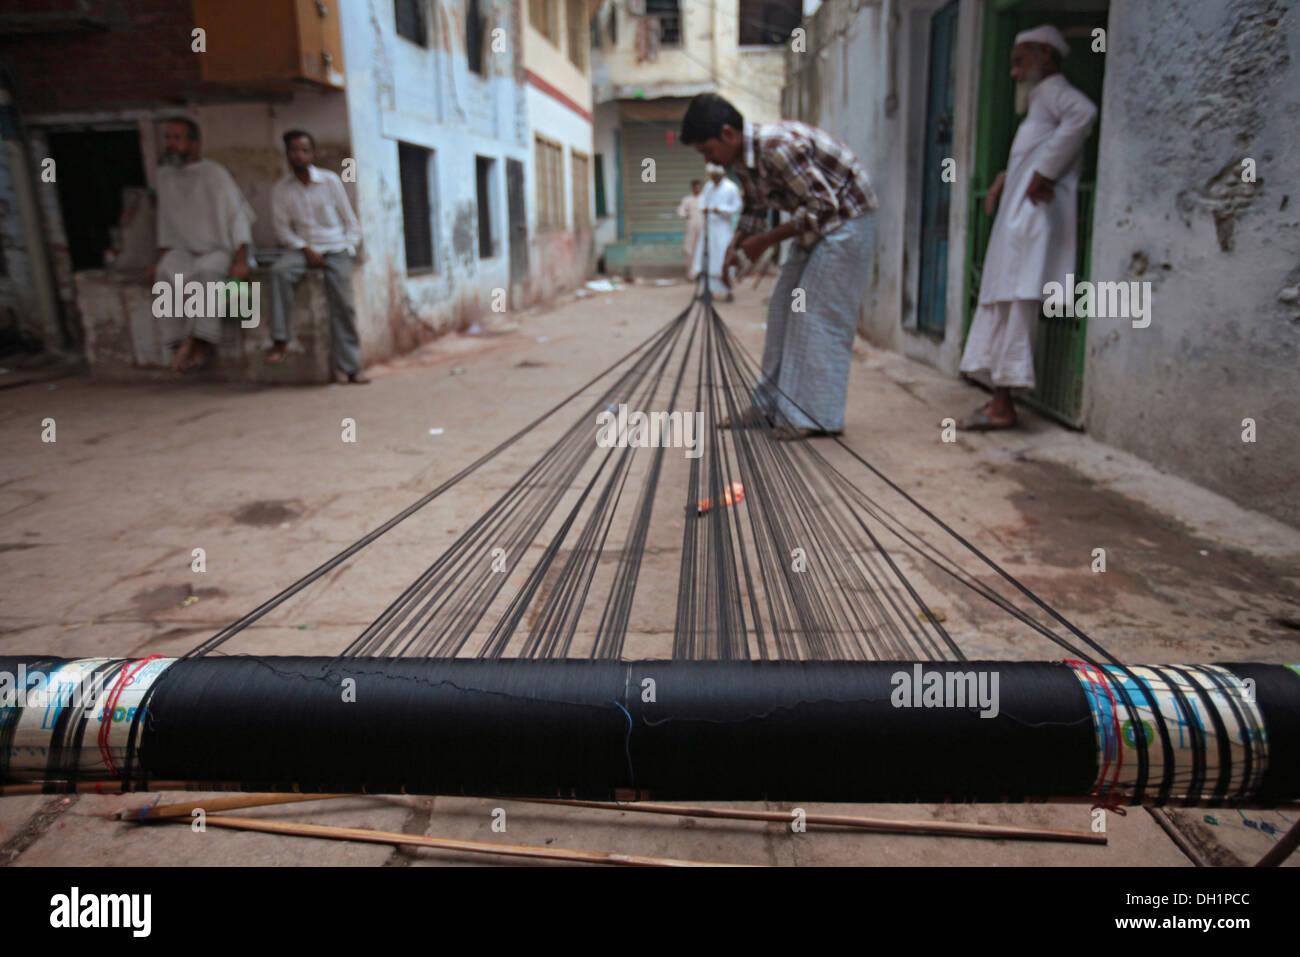 preparing warp thread for weaving Banarasi sarees Varanasi Uttar Pradesh India - Stock Image